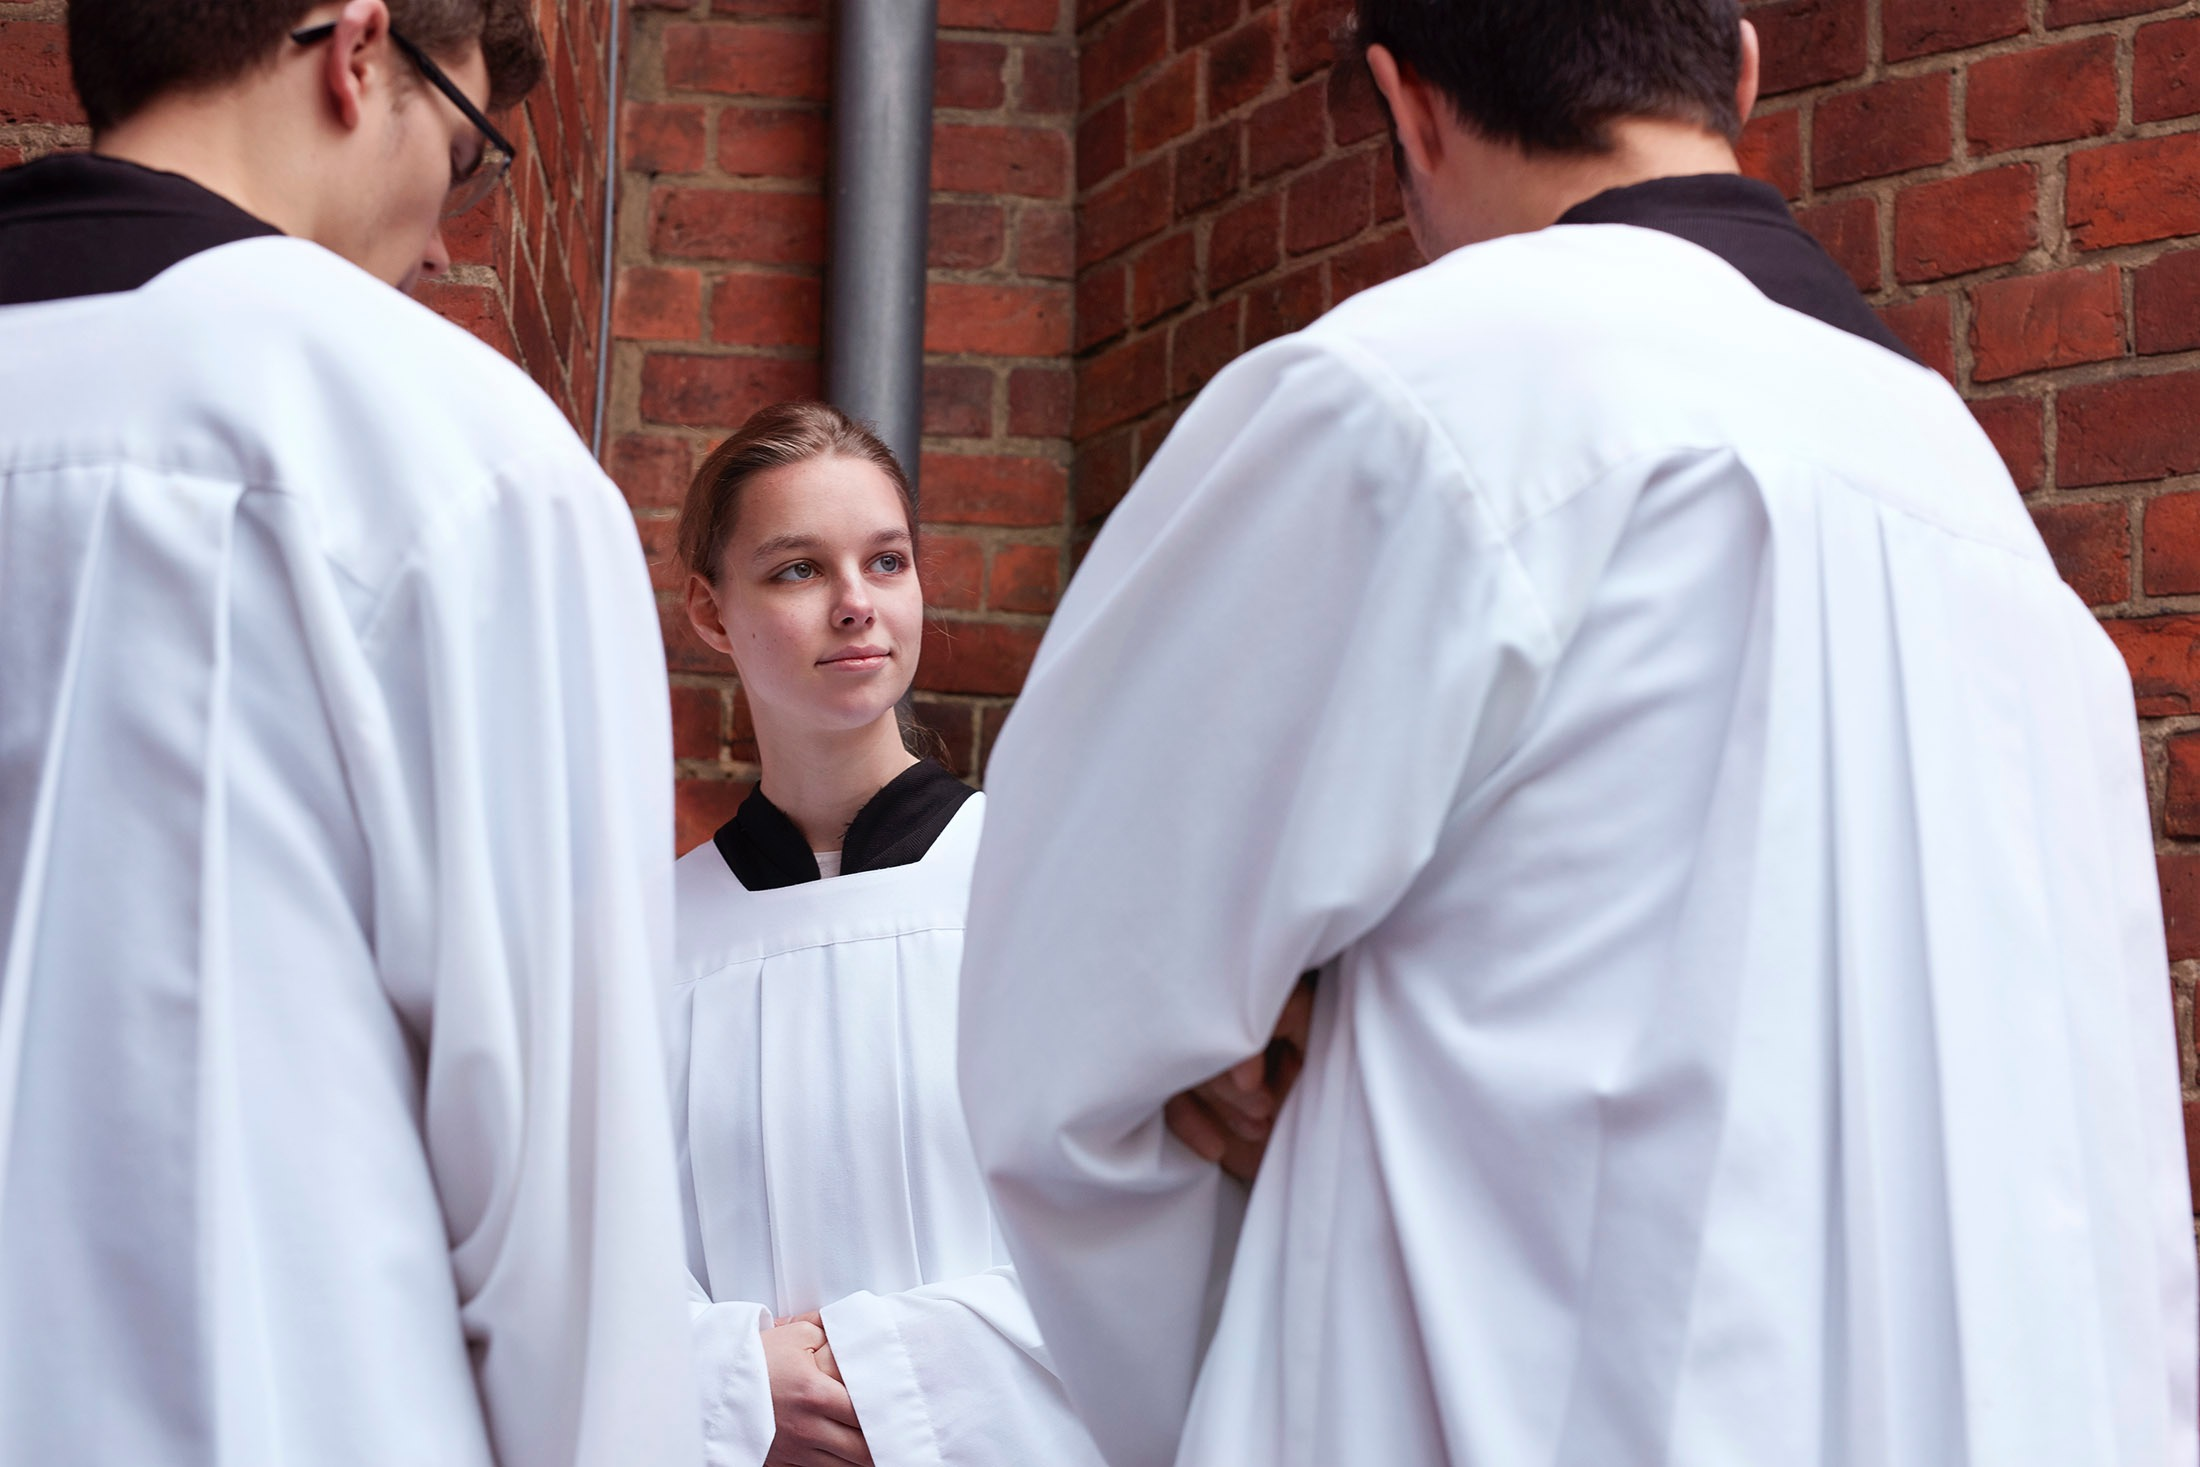 photo photography photographer church religion religious